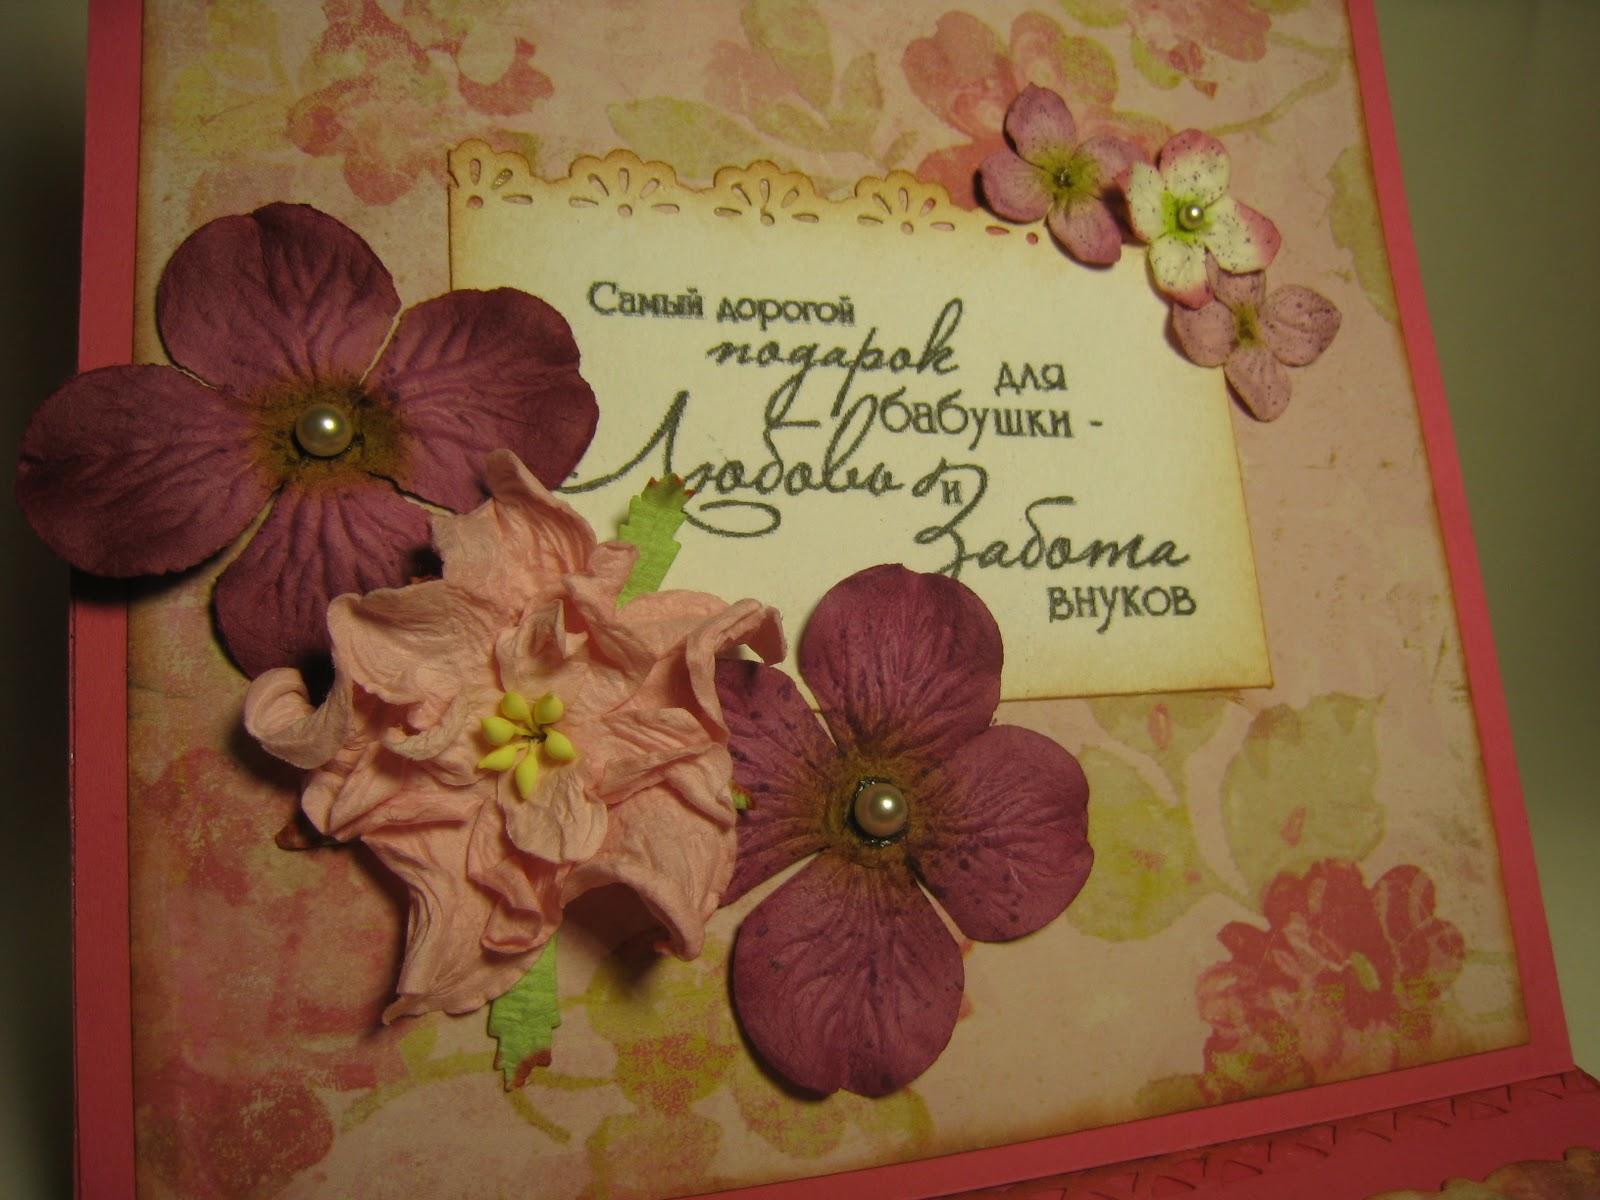 Поздравление на юбилей 75 бабушке от